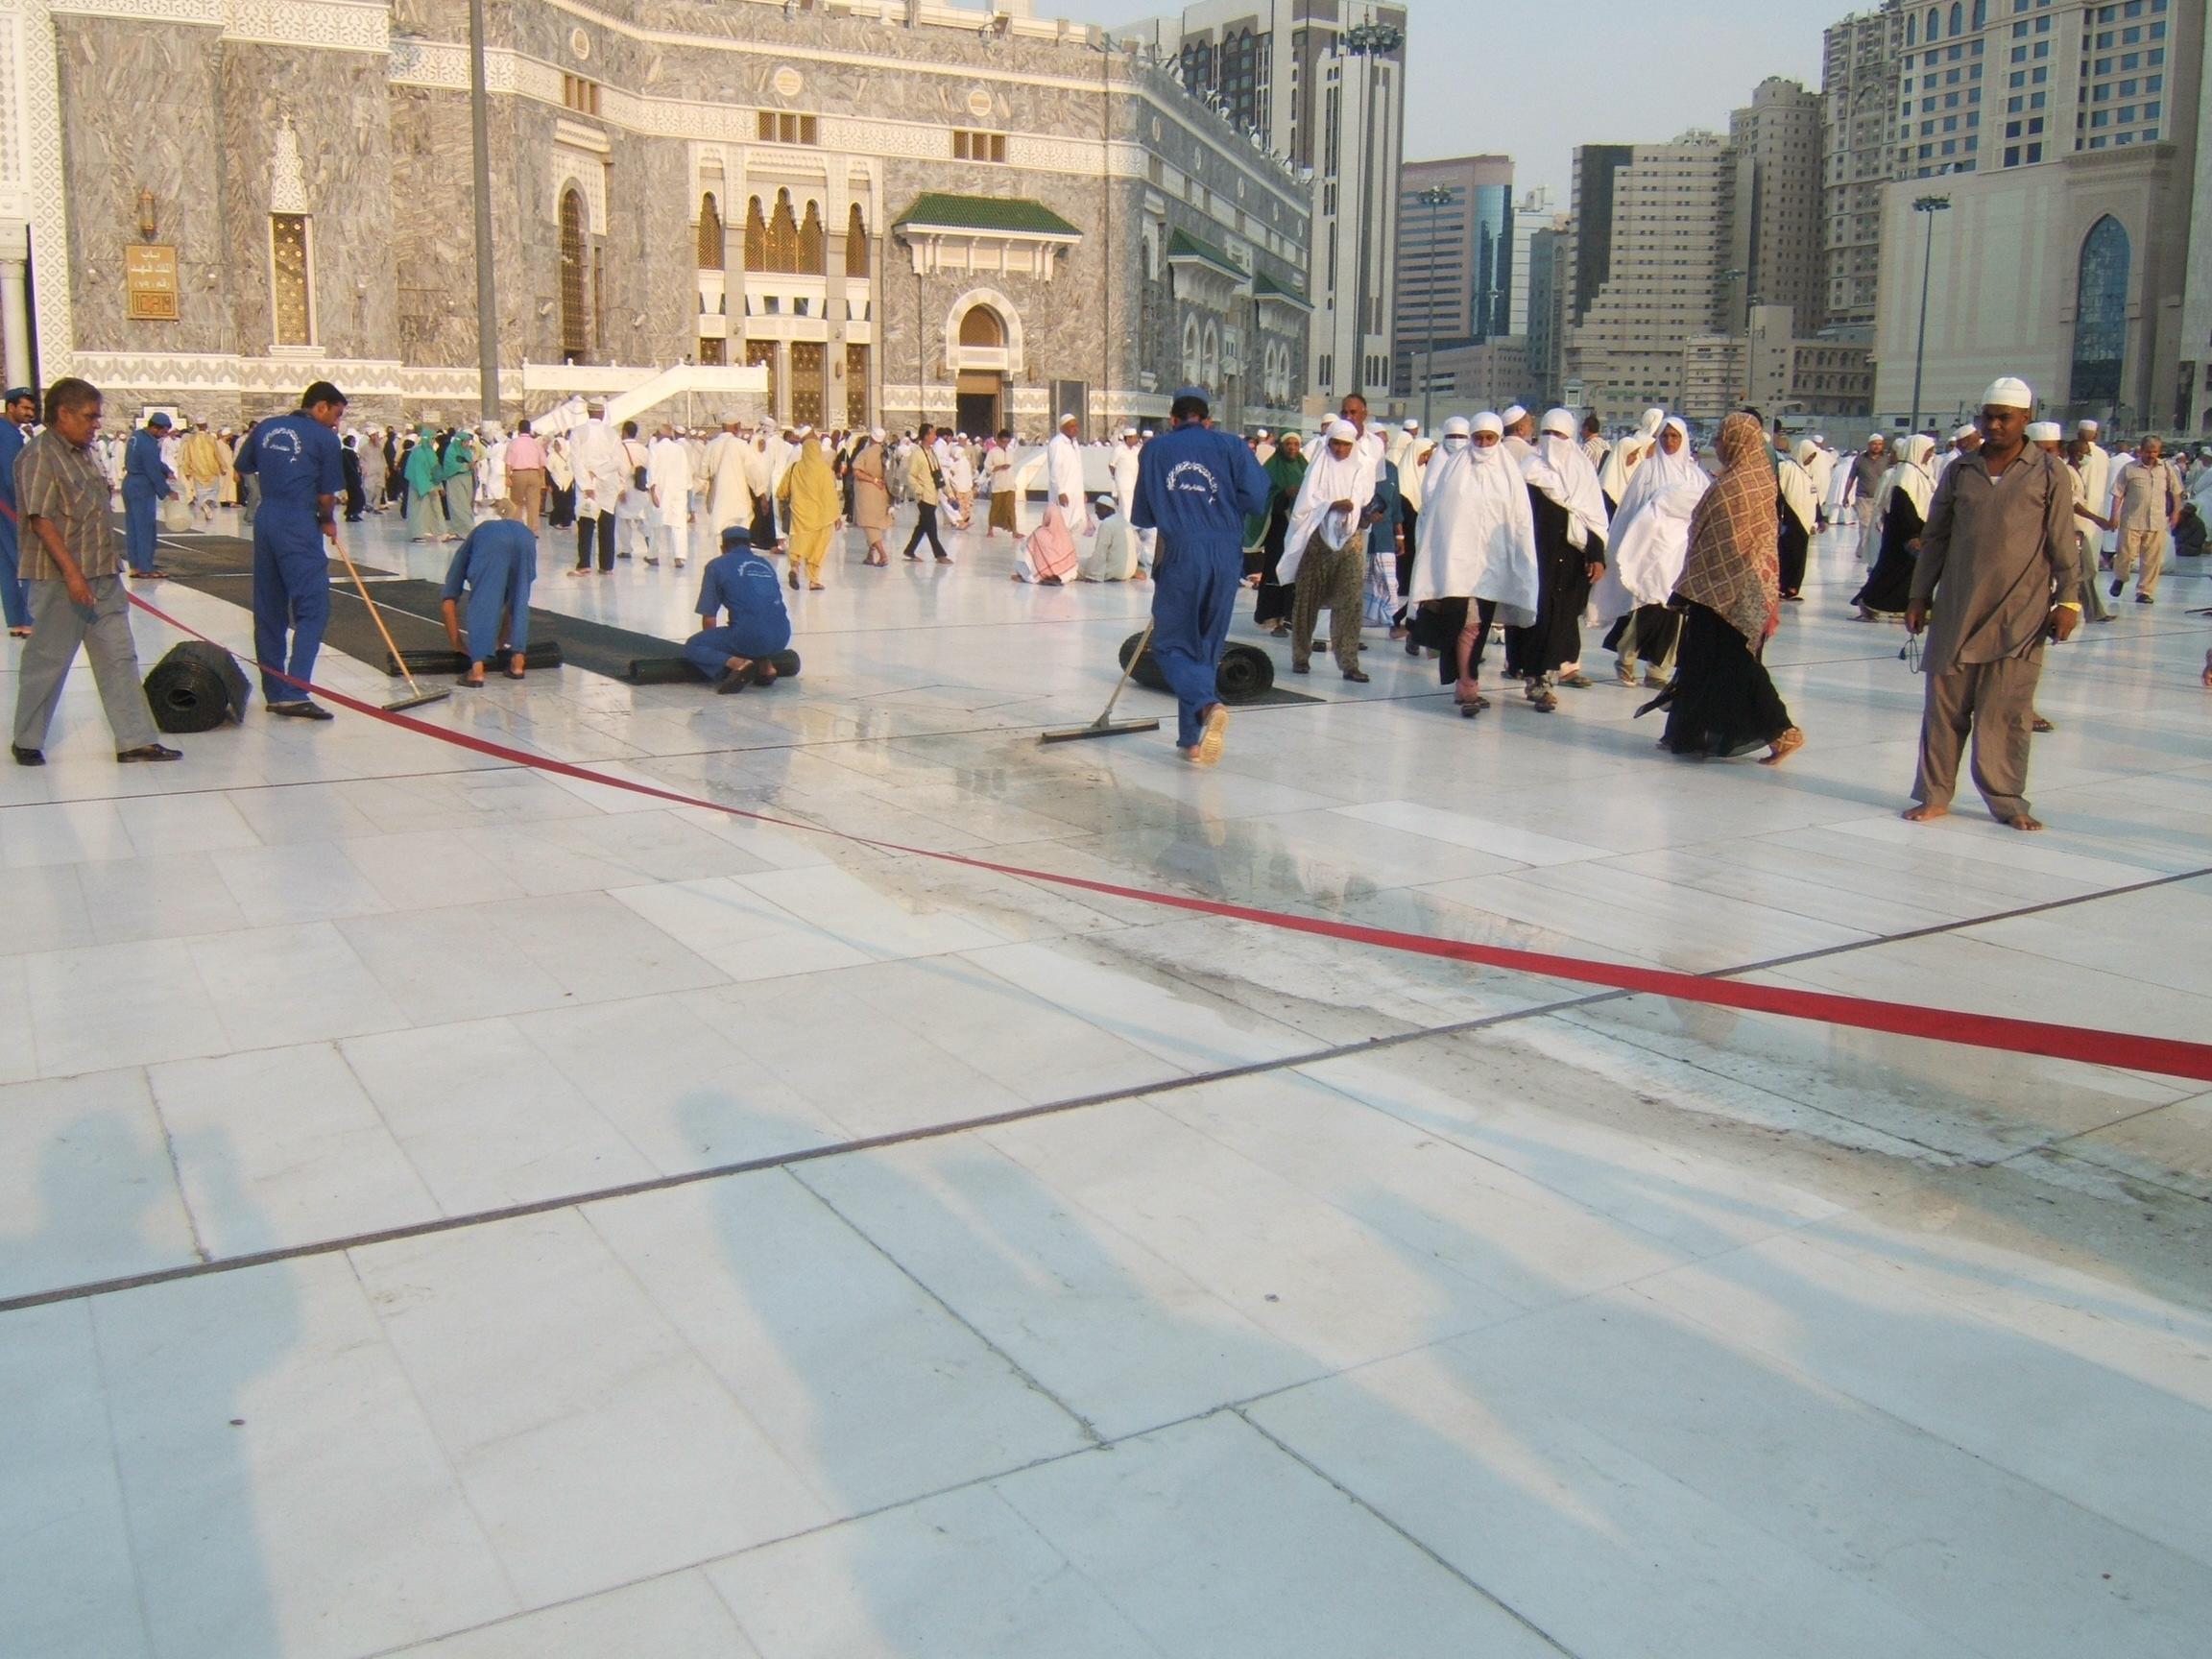 """Gulung karpet pasang kembali"" puluhribuan jamaah tumpah ruah, membuat kotor dan berbau lantai Masjidil Haram, dengan cekatan petugas pembersihan priodik membersihkannya."